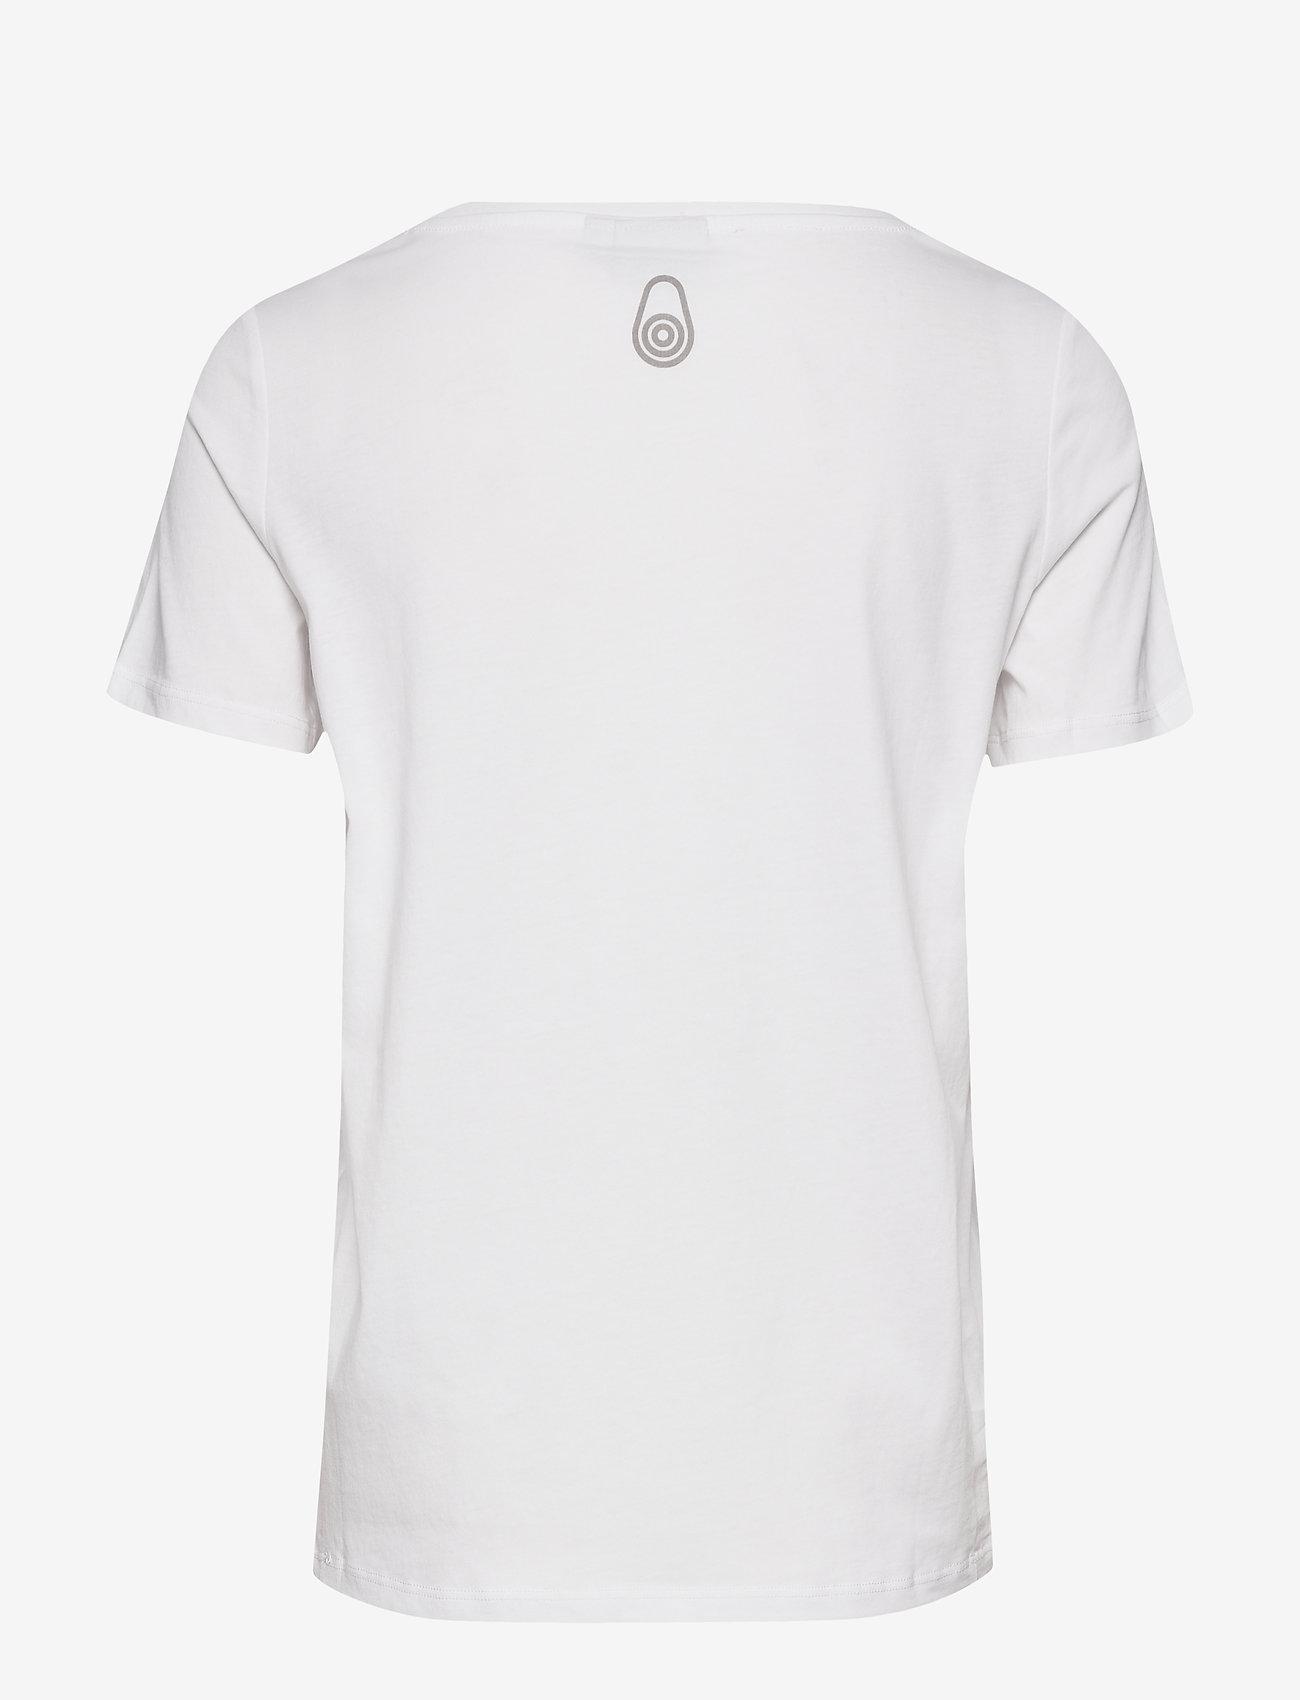 Sail Racing - W GAIL TEE#2 - t-shirts - white - 1